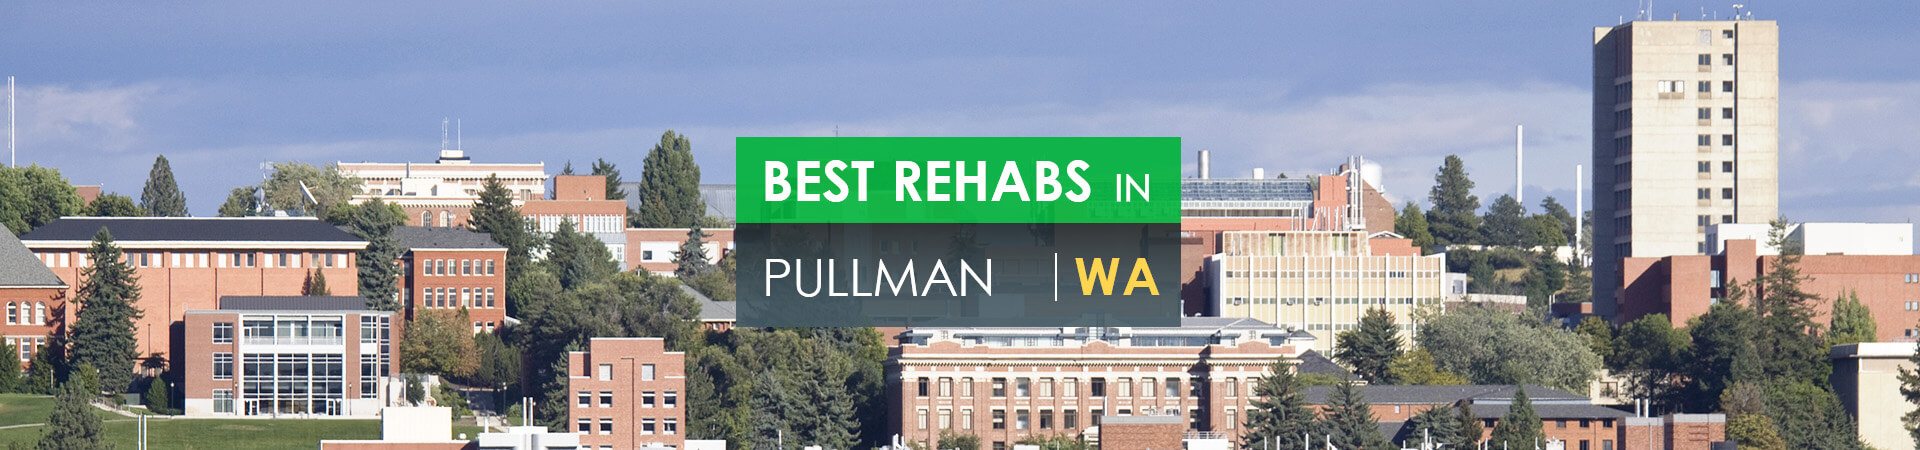 Best rehabs in Pullman, WA